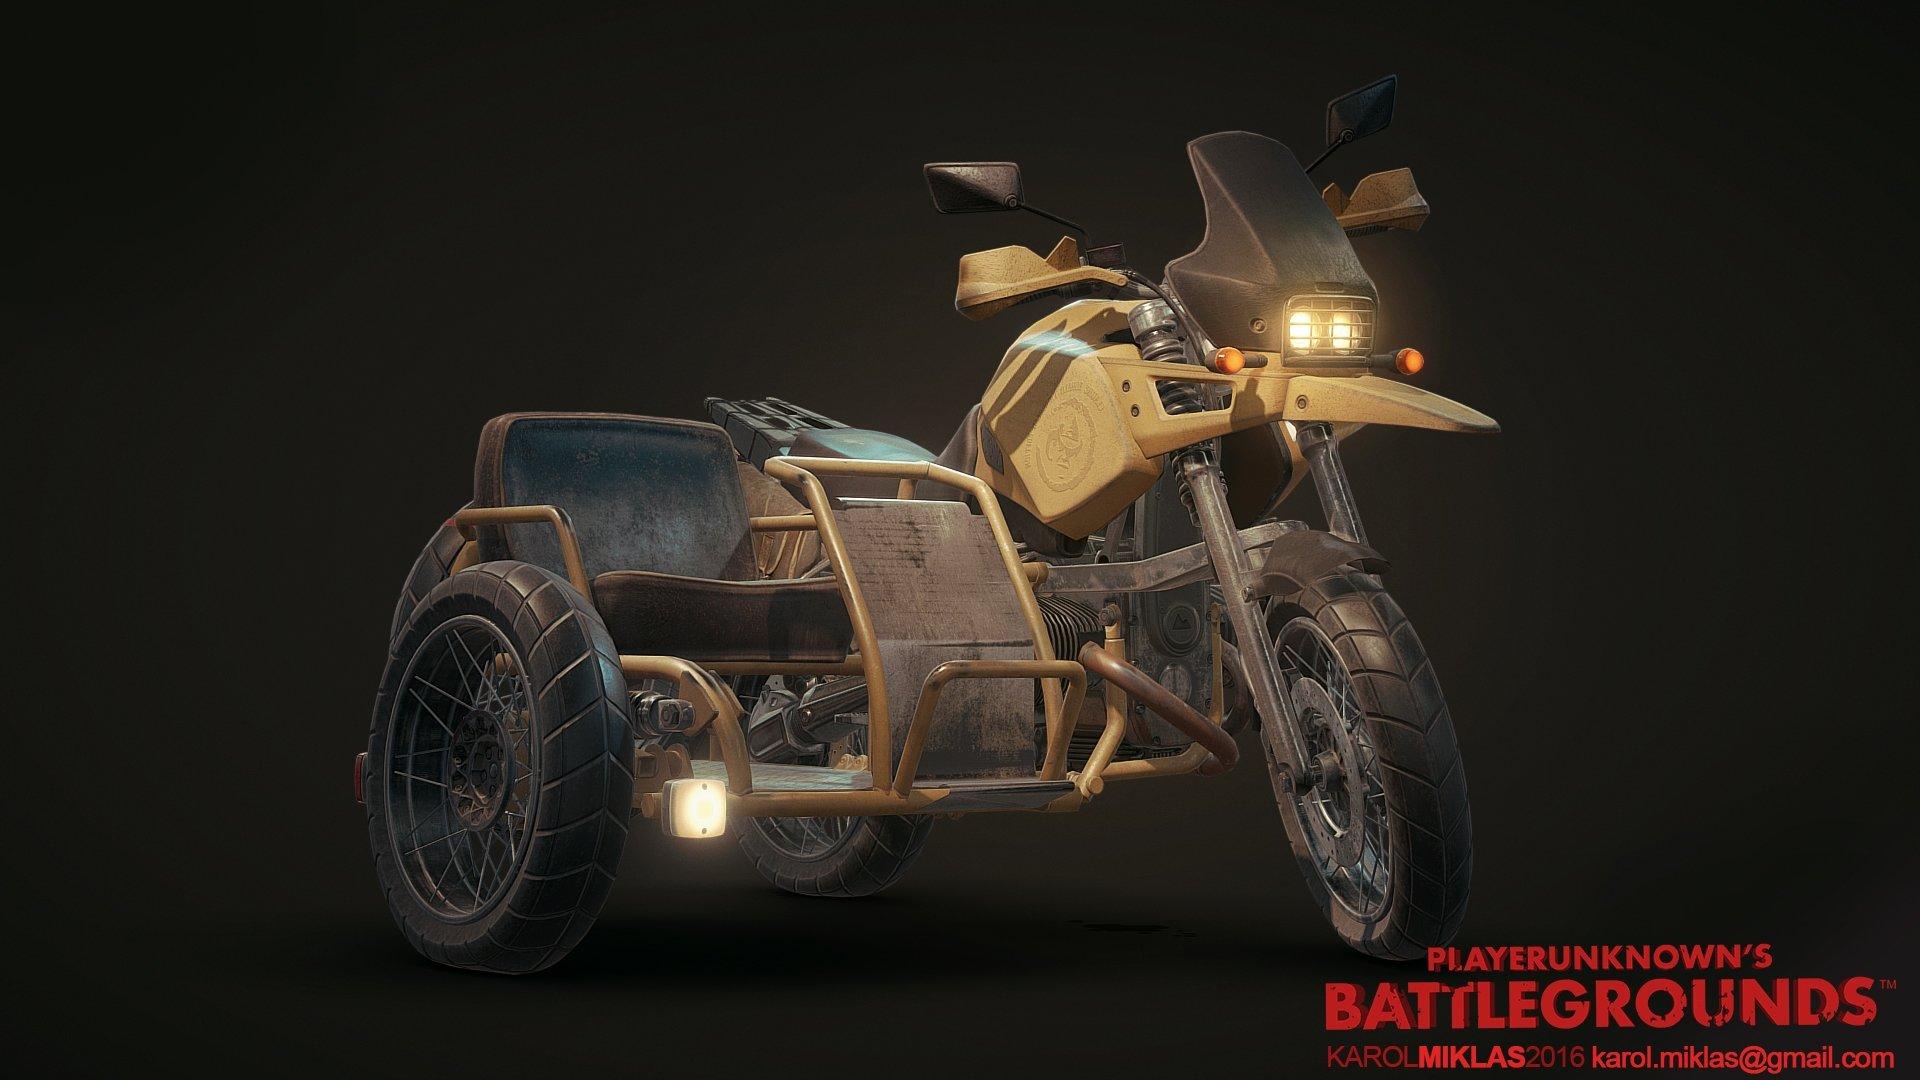 Pubg Mobile Helmet Wallpaper Pubg Pubgwallpapers: [Art Dump] PU: Battlegrounds Vehicles! Image Heavy